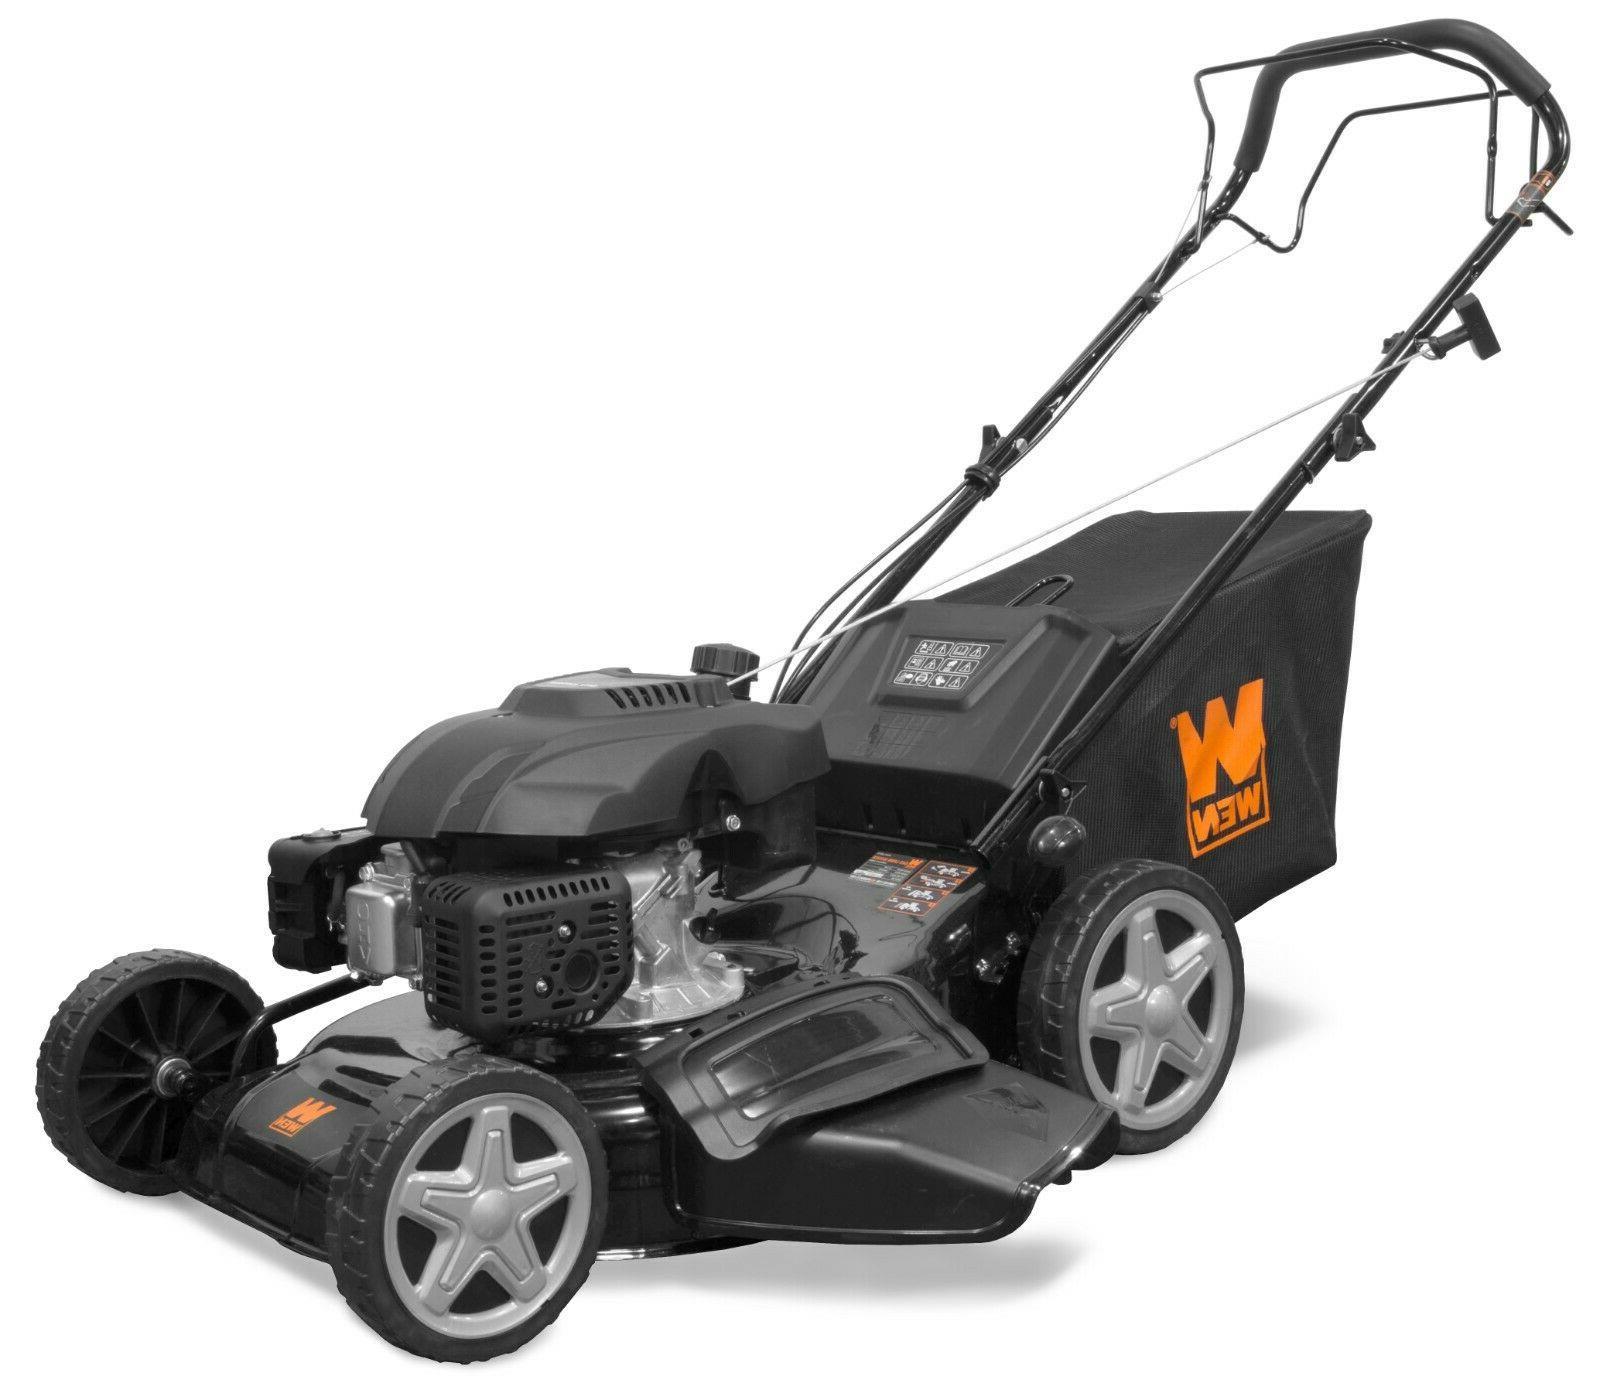 lm2173 173cc 21 inch gas powered 4